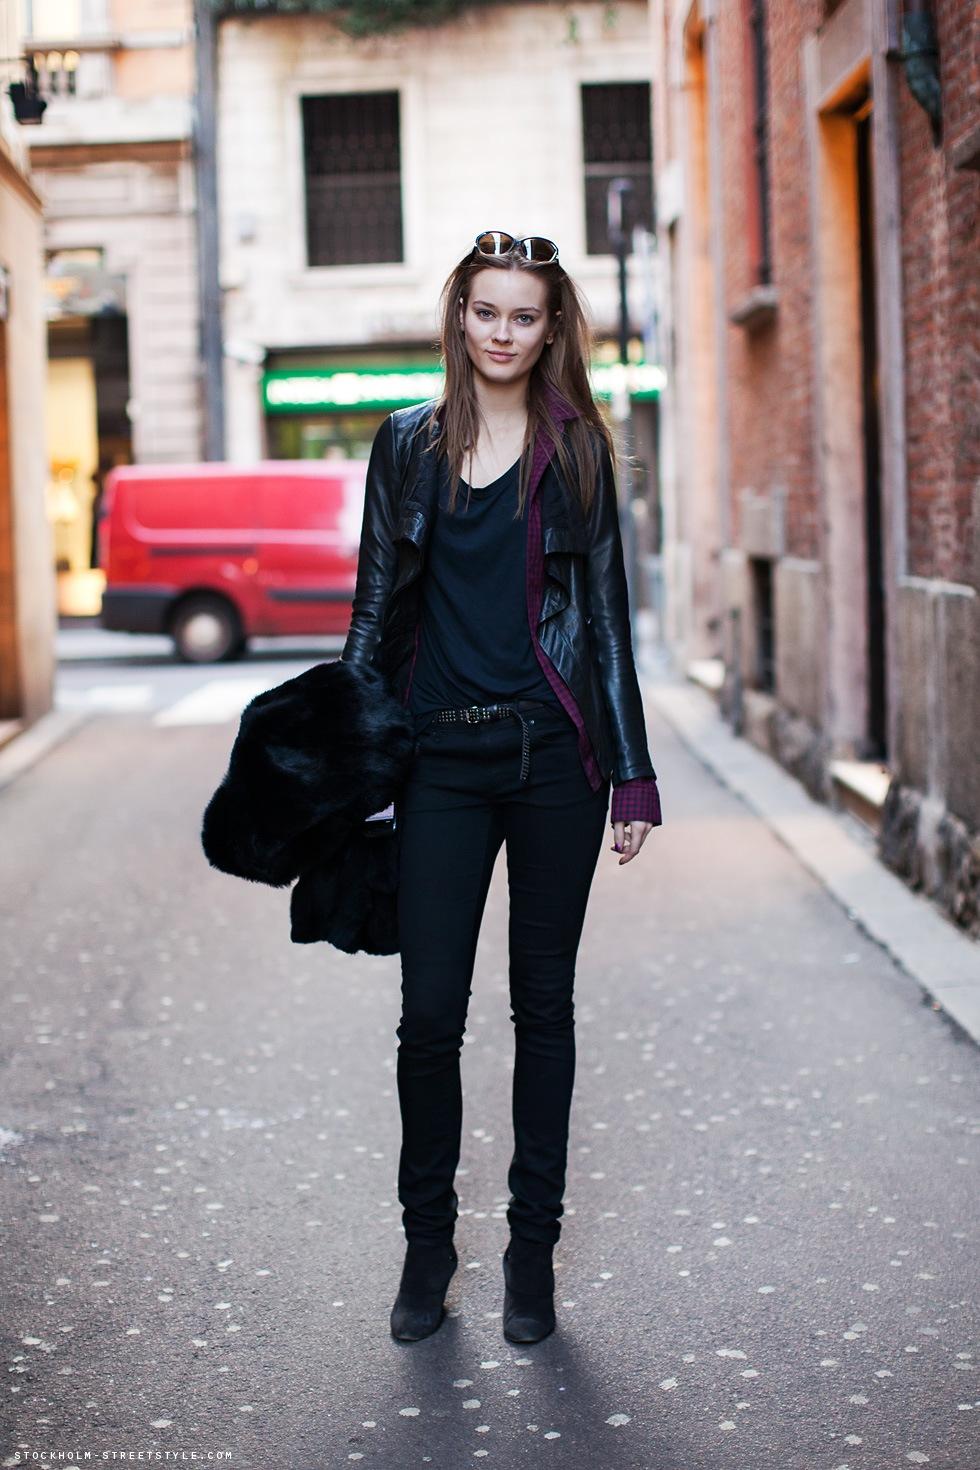 Fashion Fades Style Is Eternal Model Street Style